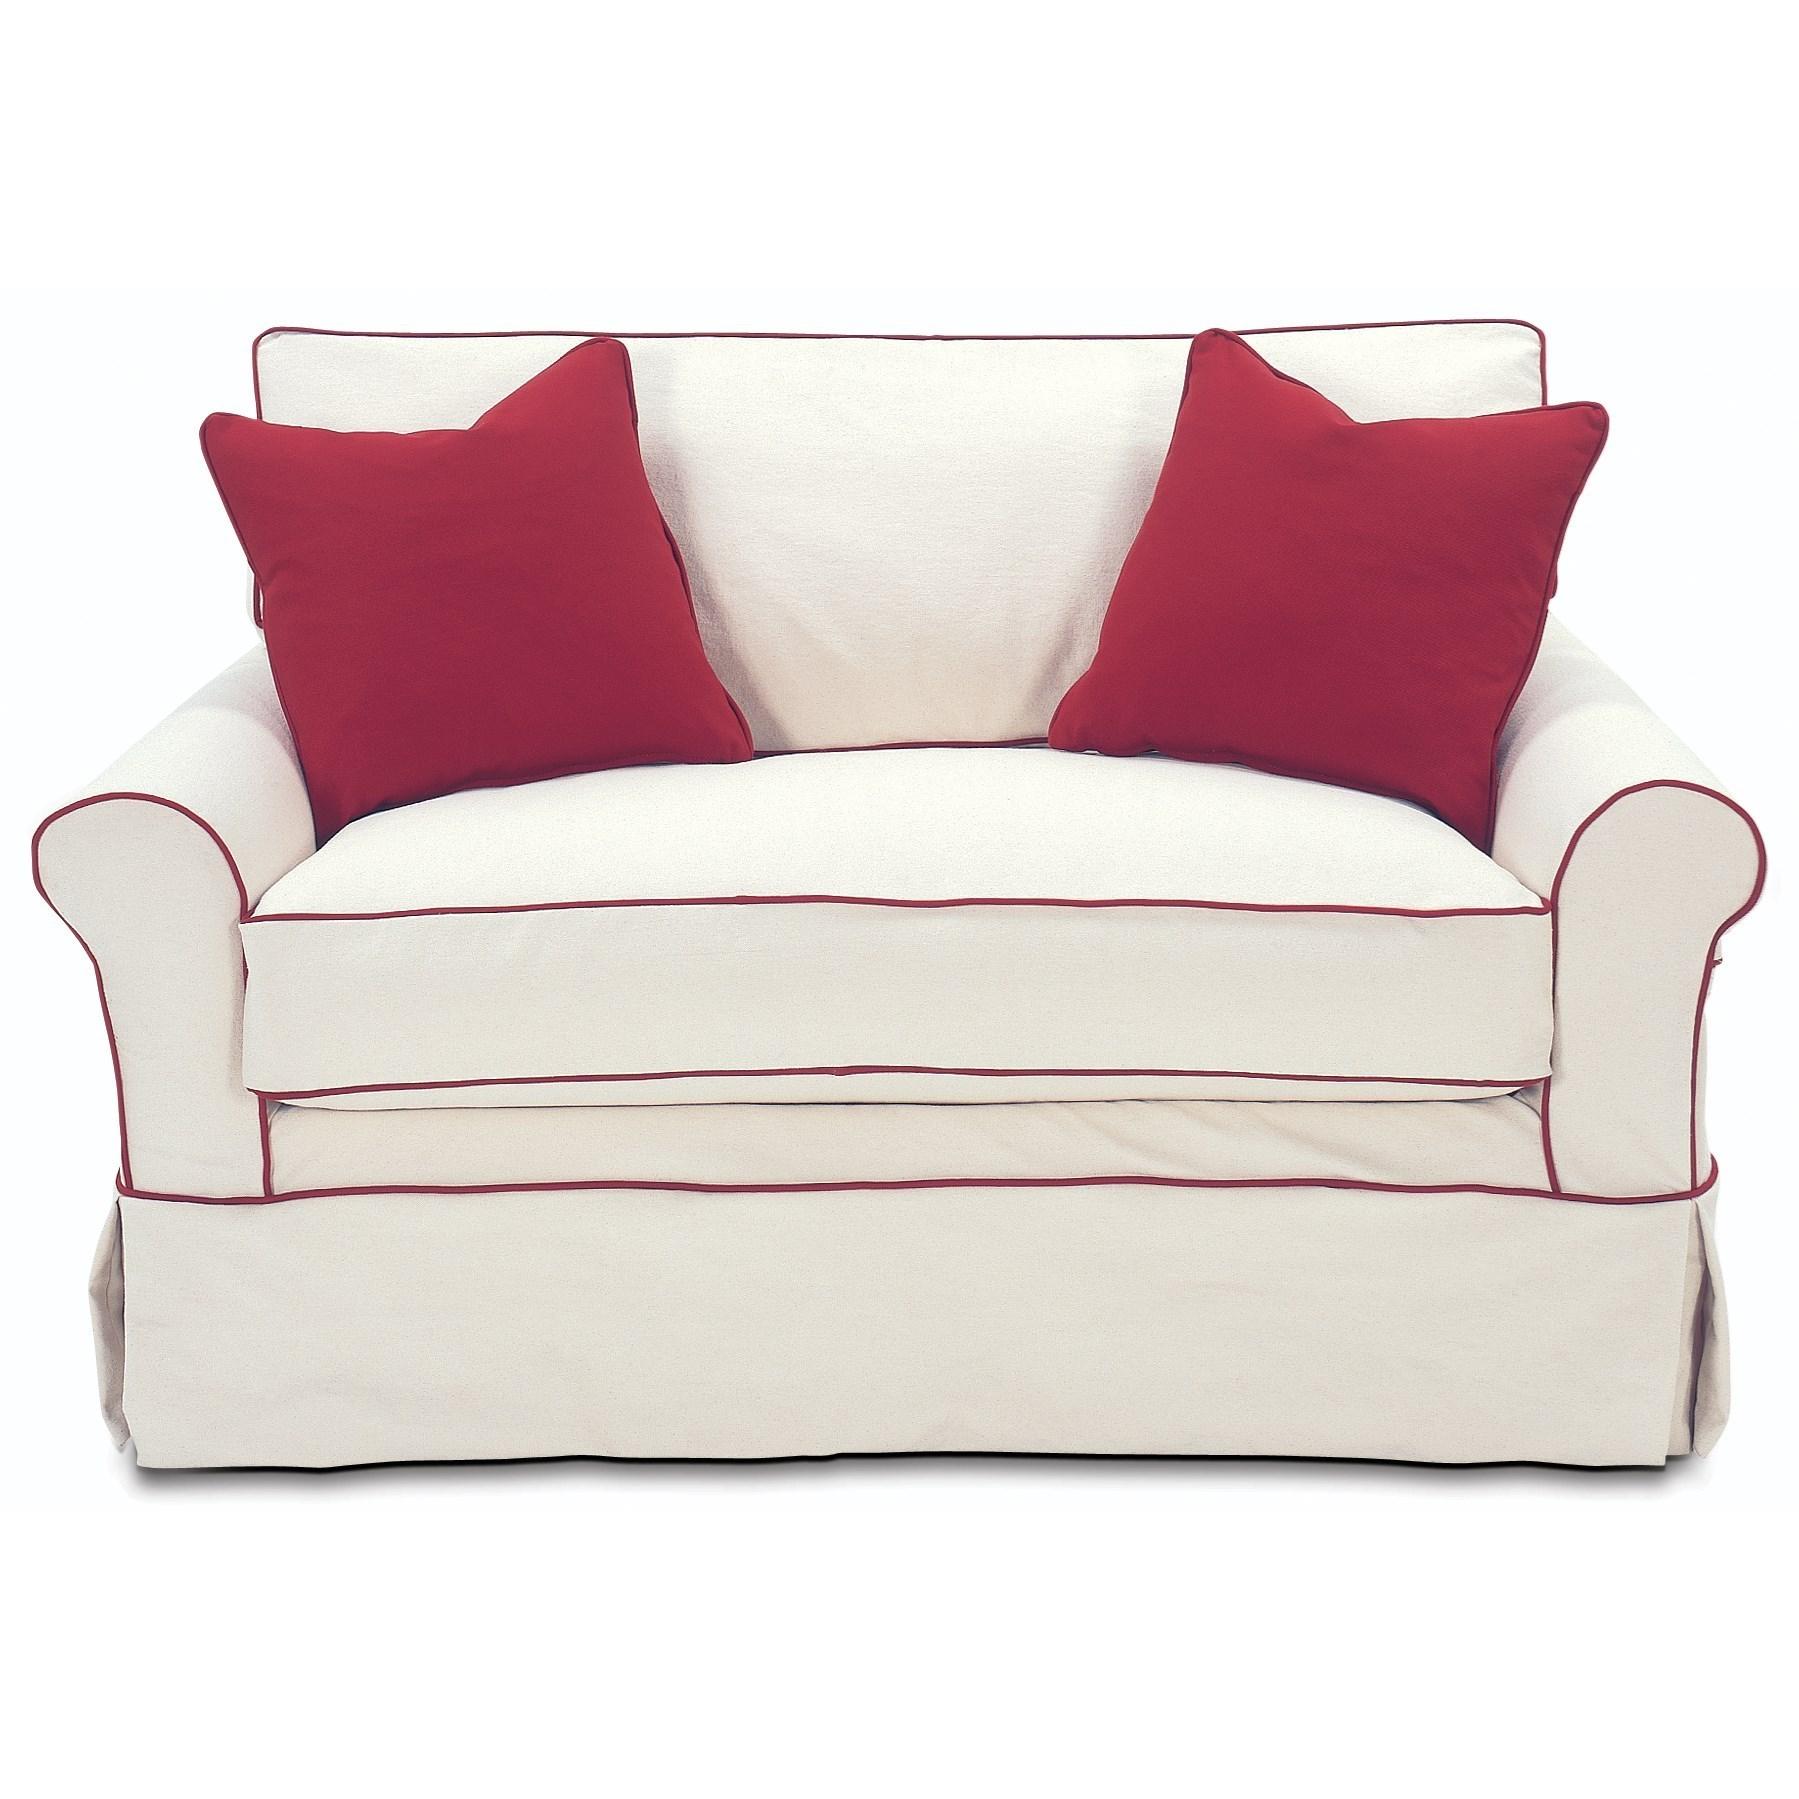 Rowe Somerset Chair With Twin Sleeper Dream Home